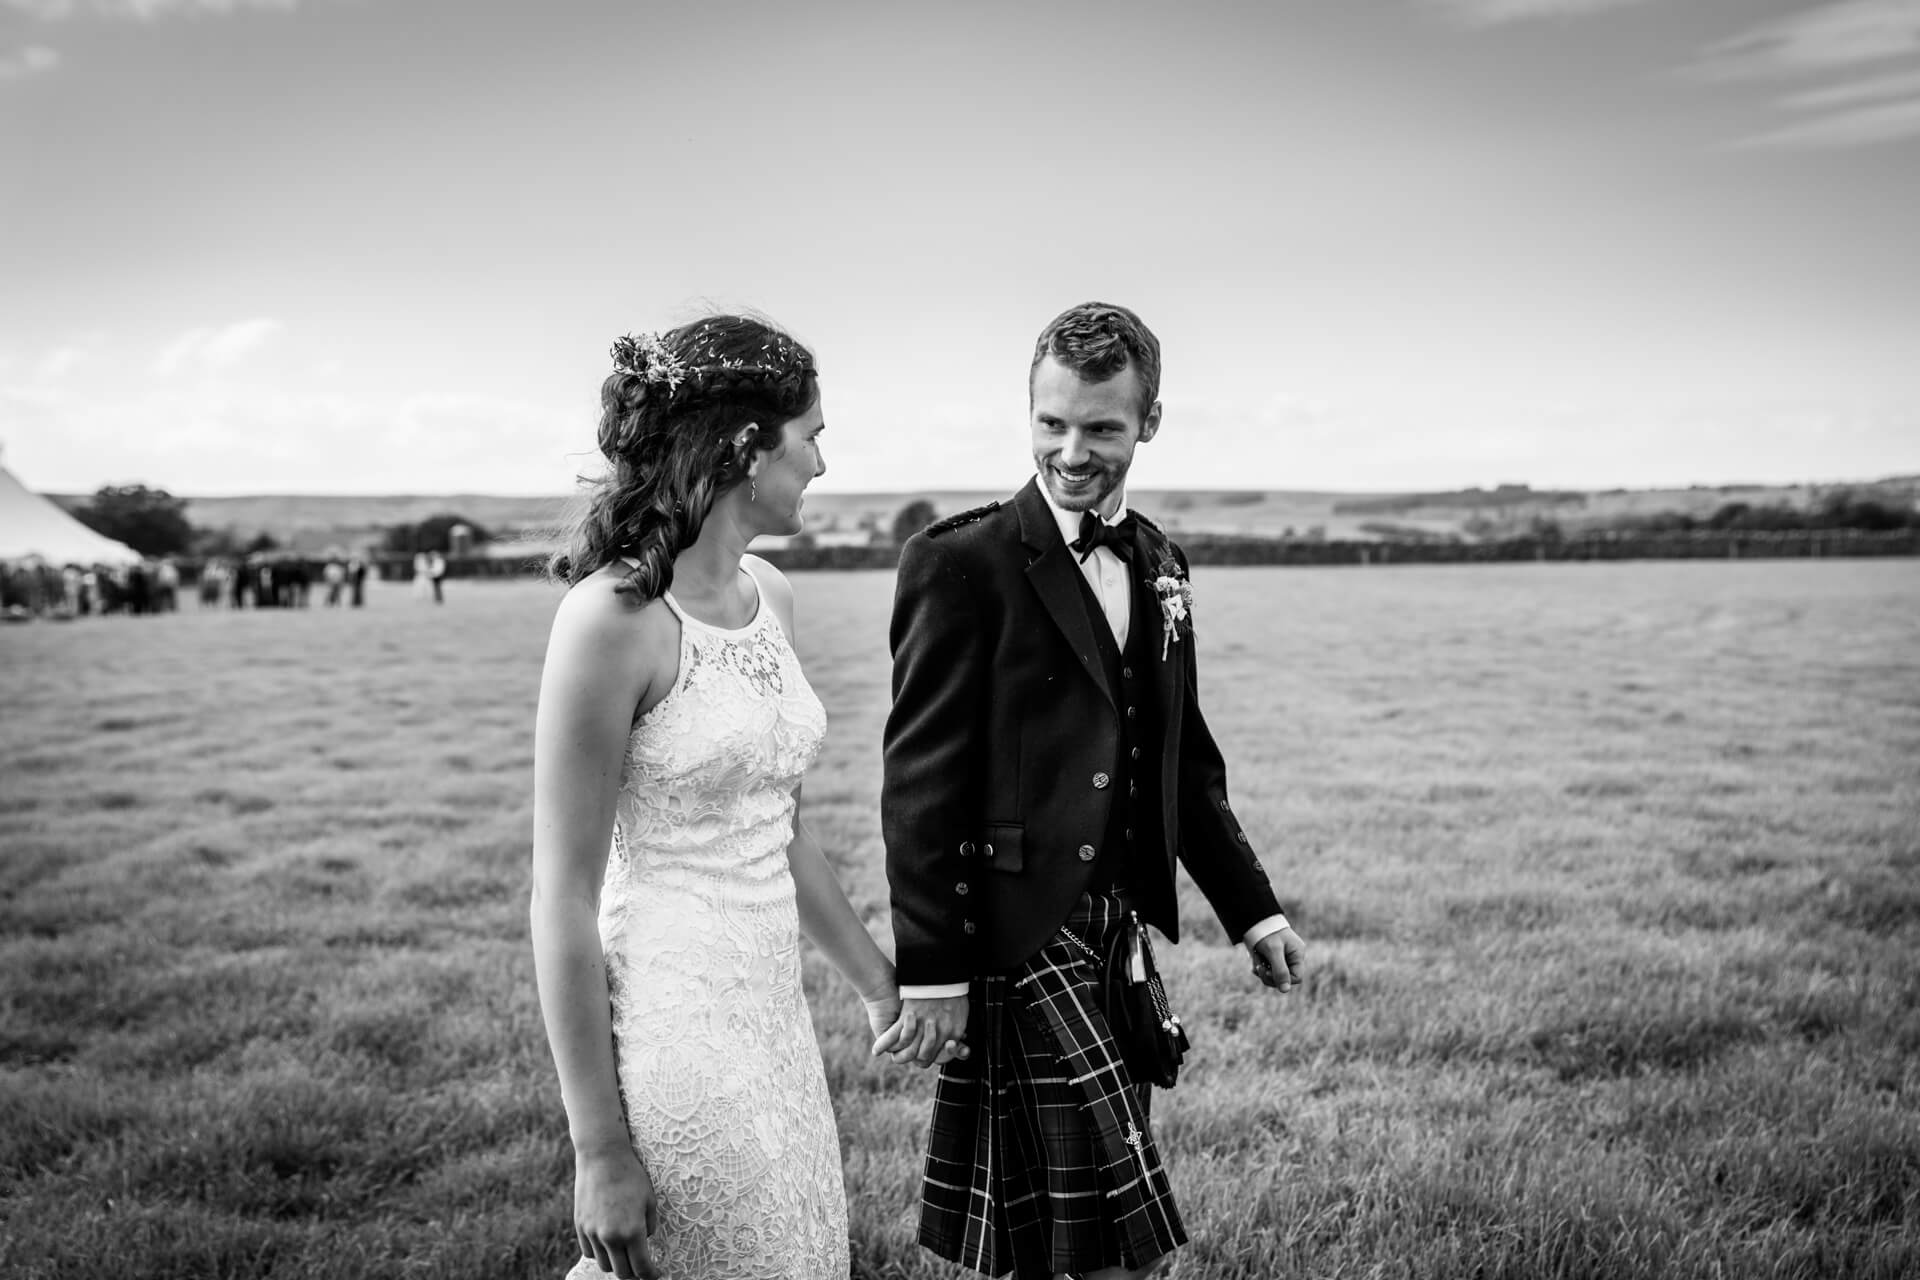 wedding couple walking hand in hand in a field